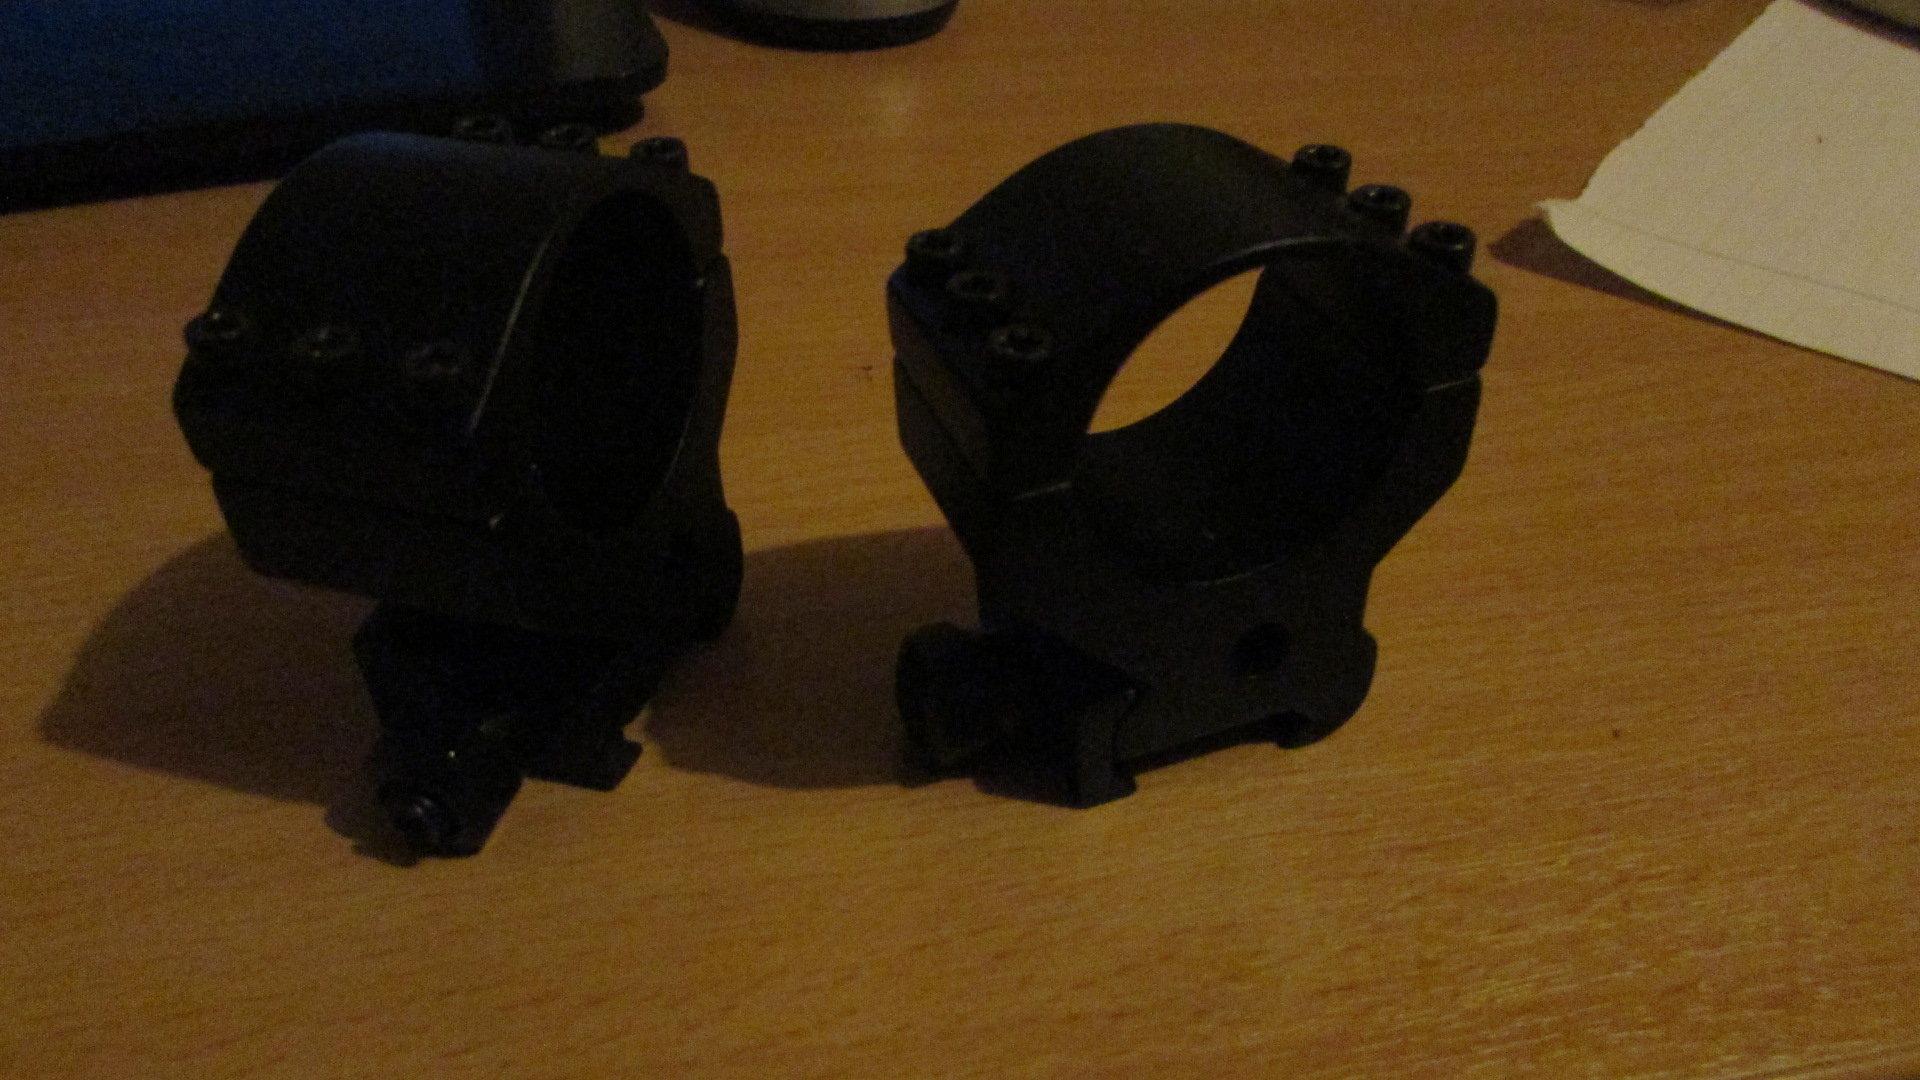 weaver/picatinny scope mount 30mm